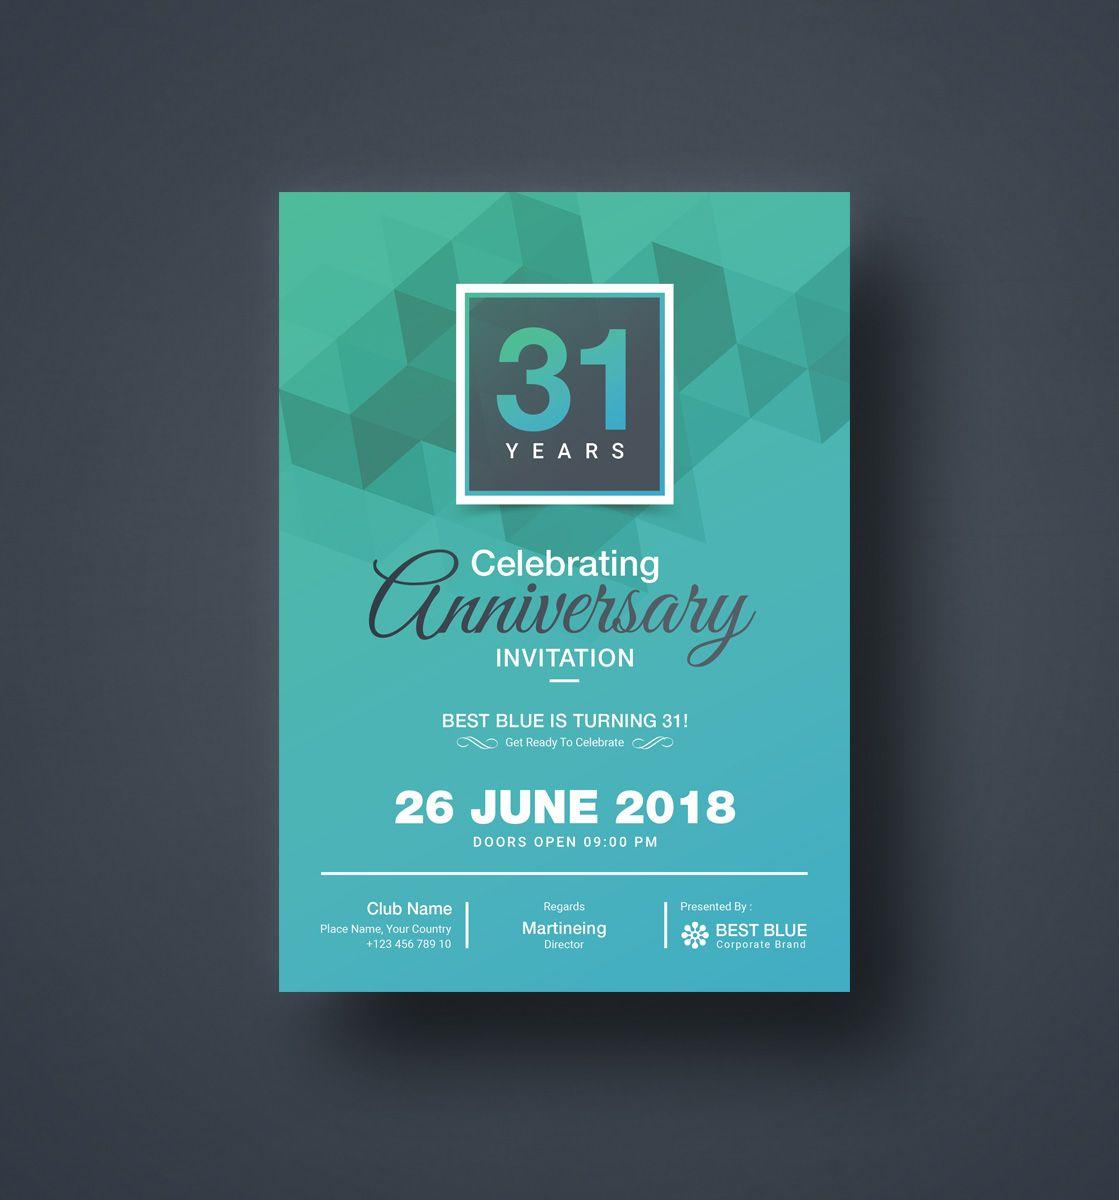 Zeus Elegant Anniversary Invitation Template In 2020 With Images Elegant Anniversary Invitations Anniversary Invitations Business Events Invitation